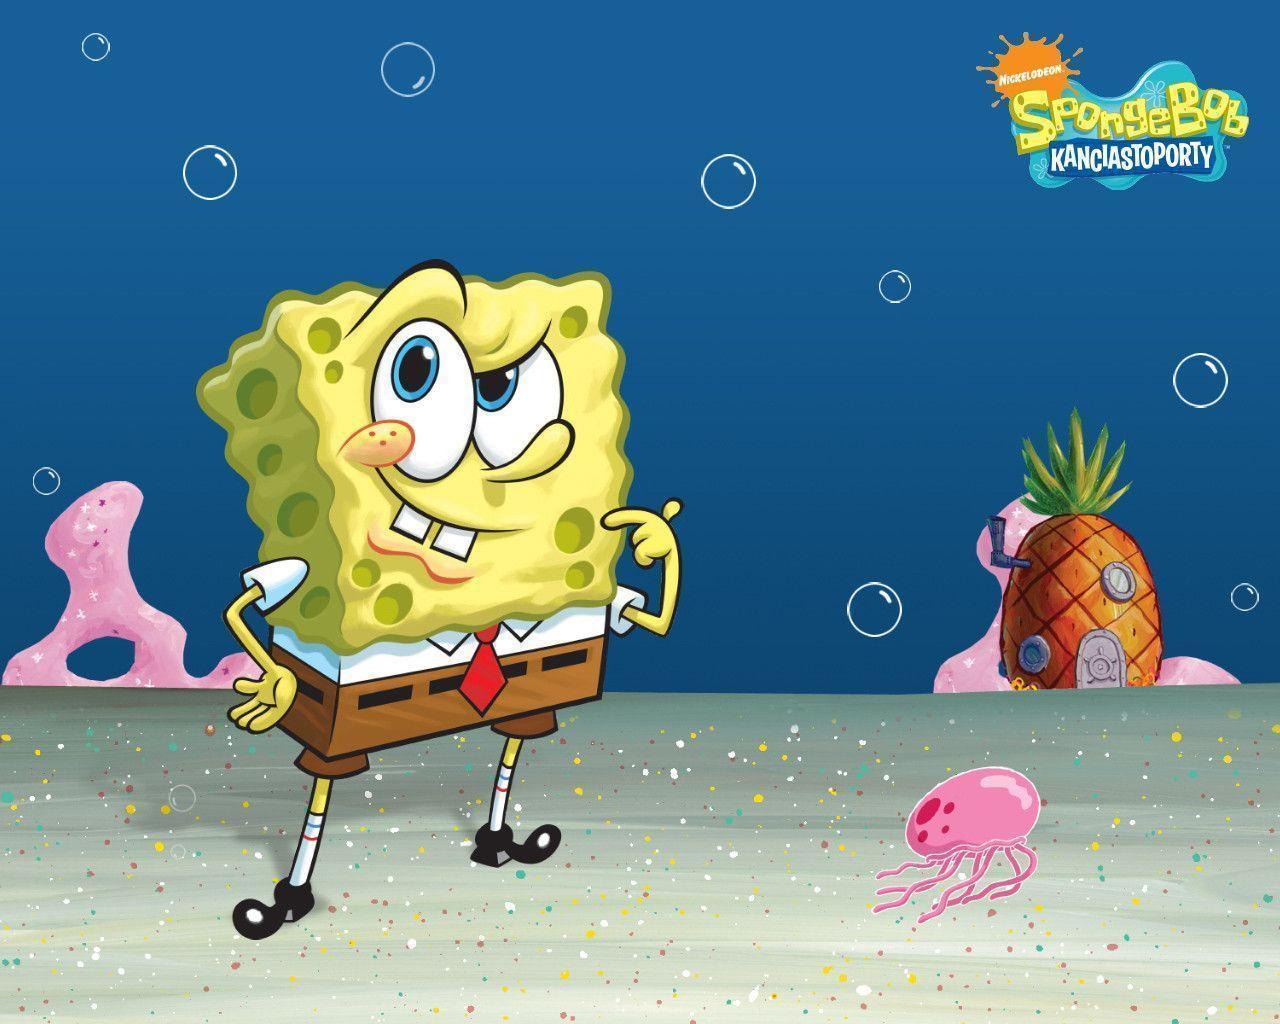 from Demetrius gay spongebob back ground